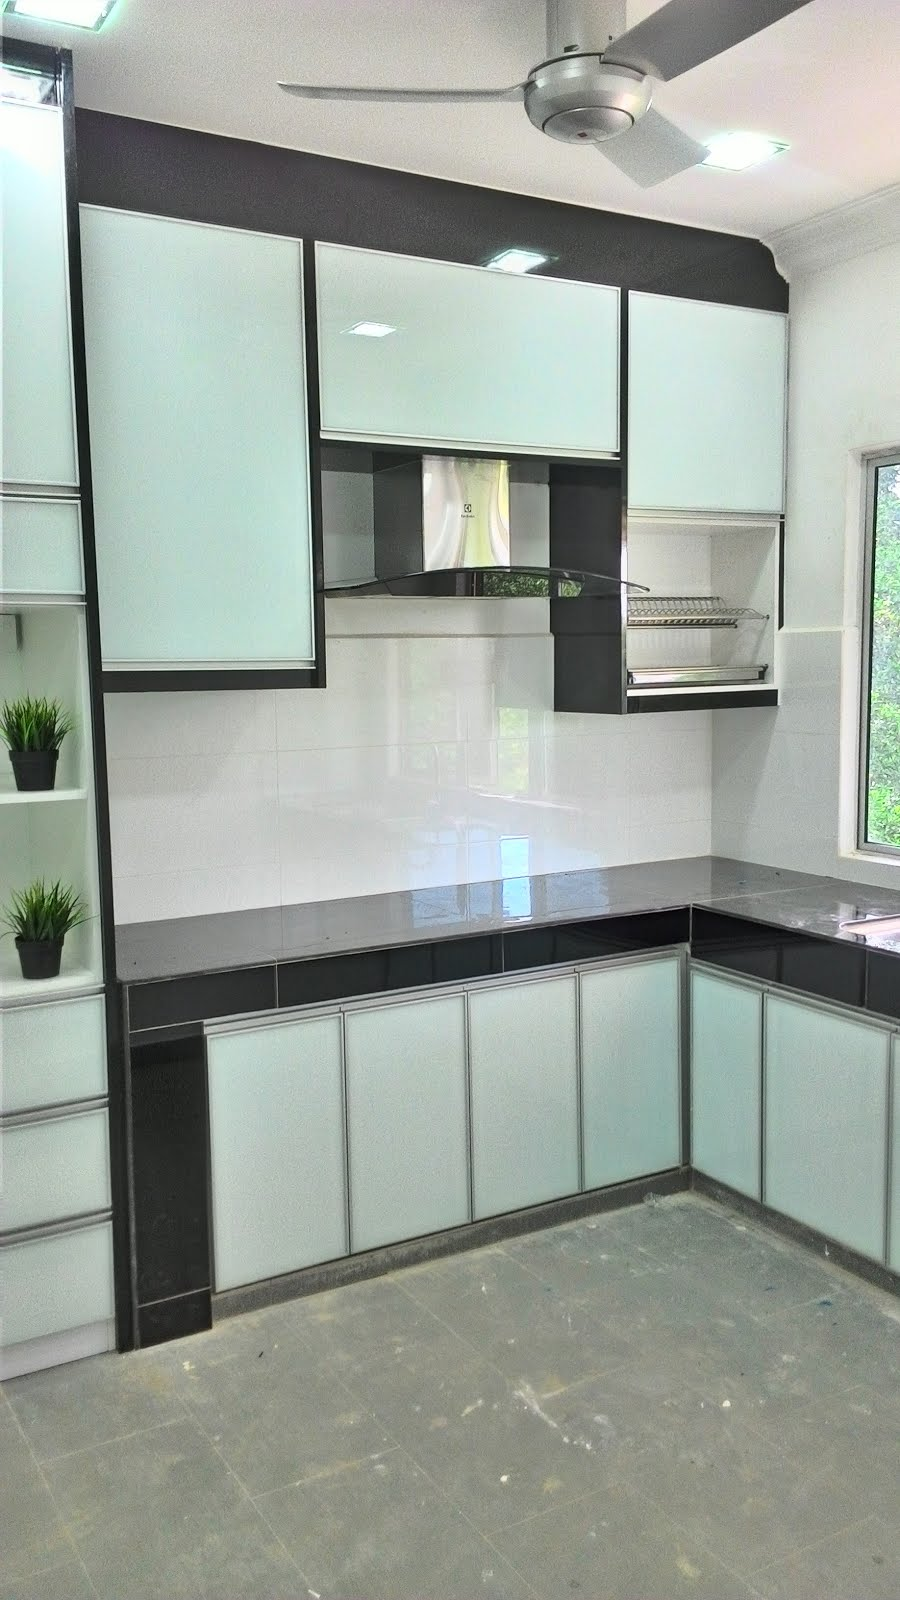 Tip Pasang Kabinet Dapur Keempat Pergau Kitchen Kedai Kelantan